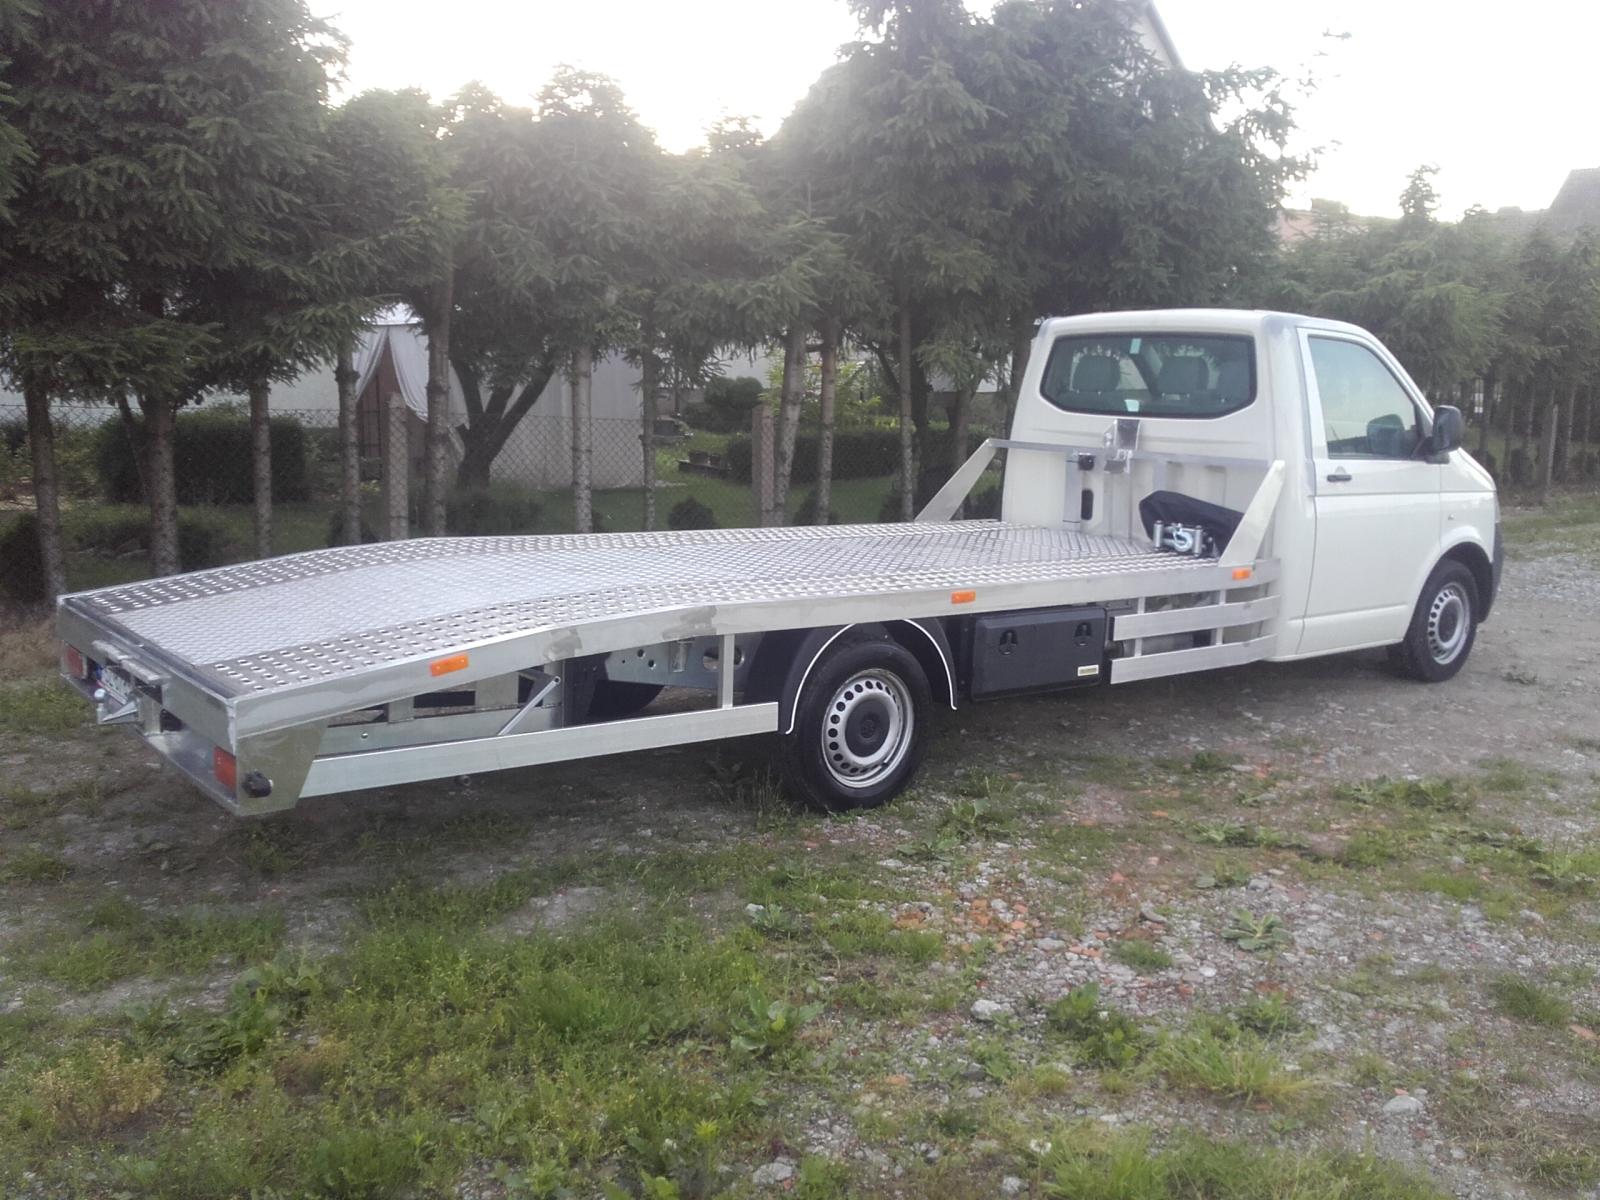 Vw T5 T6 Zabudowa Autolaweta Aluminiowa Rama Alko 7050185668